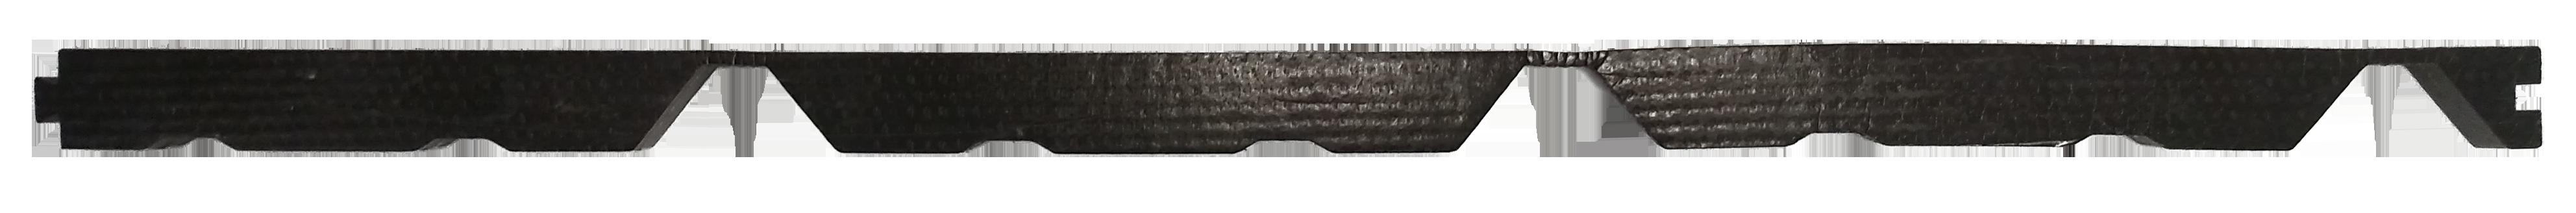 PBRCL - PBR-1236 LARGE CLOSURE